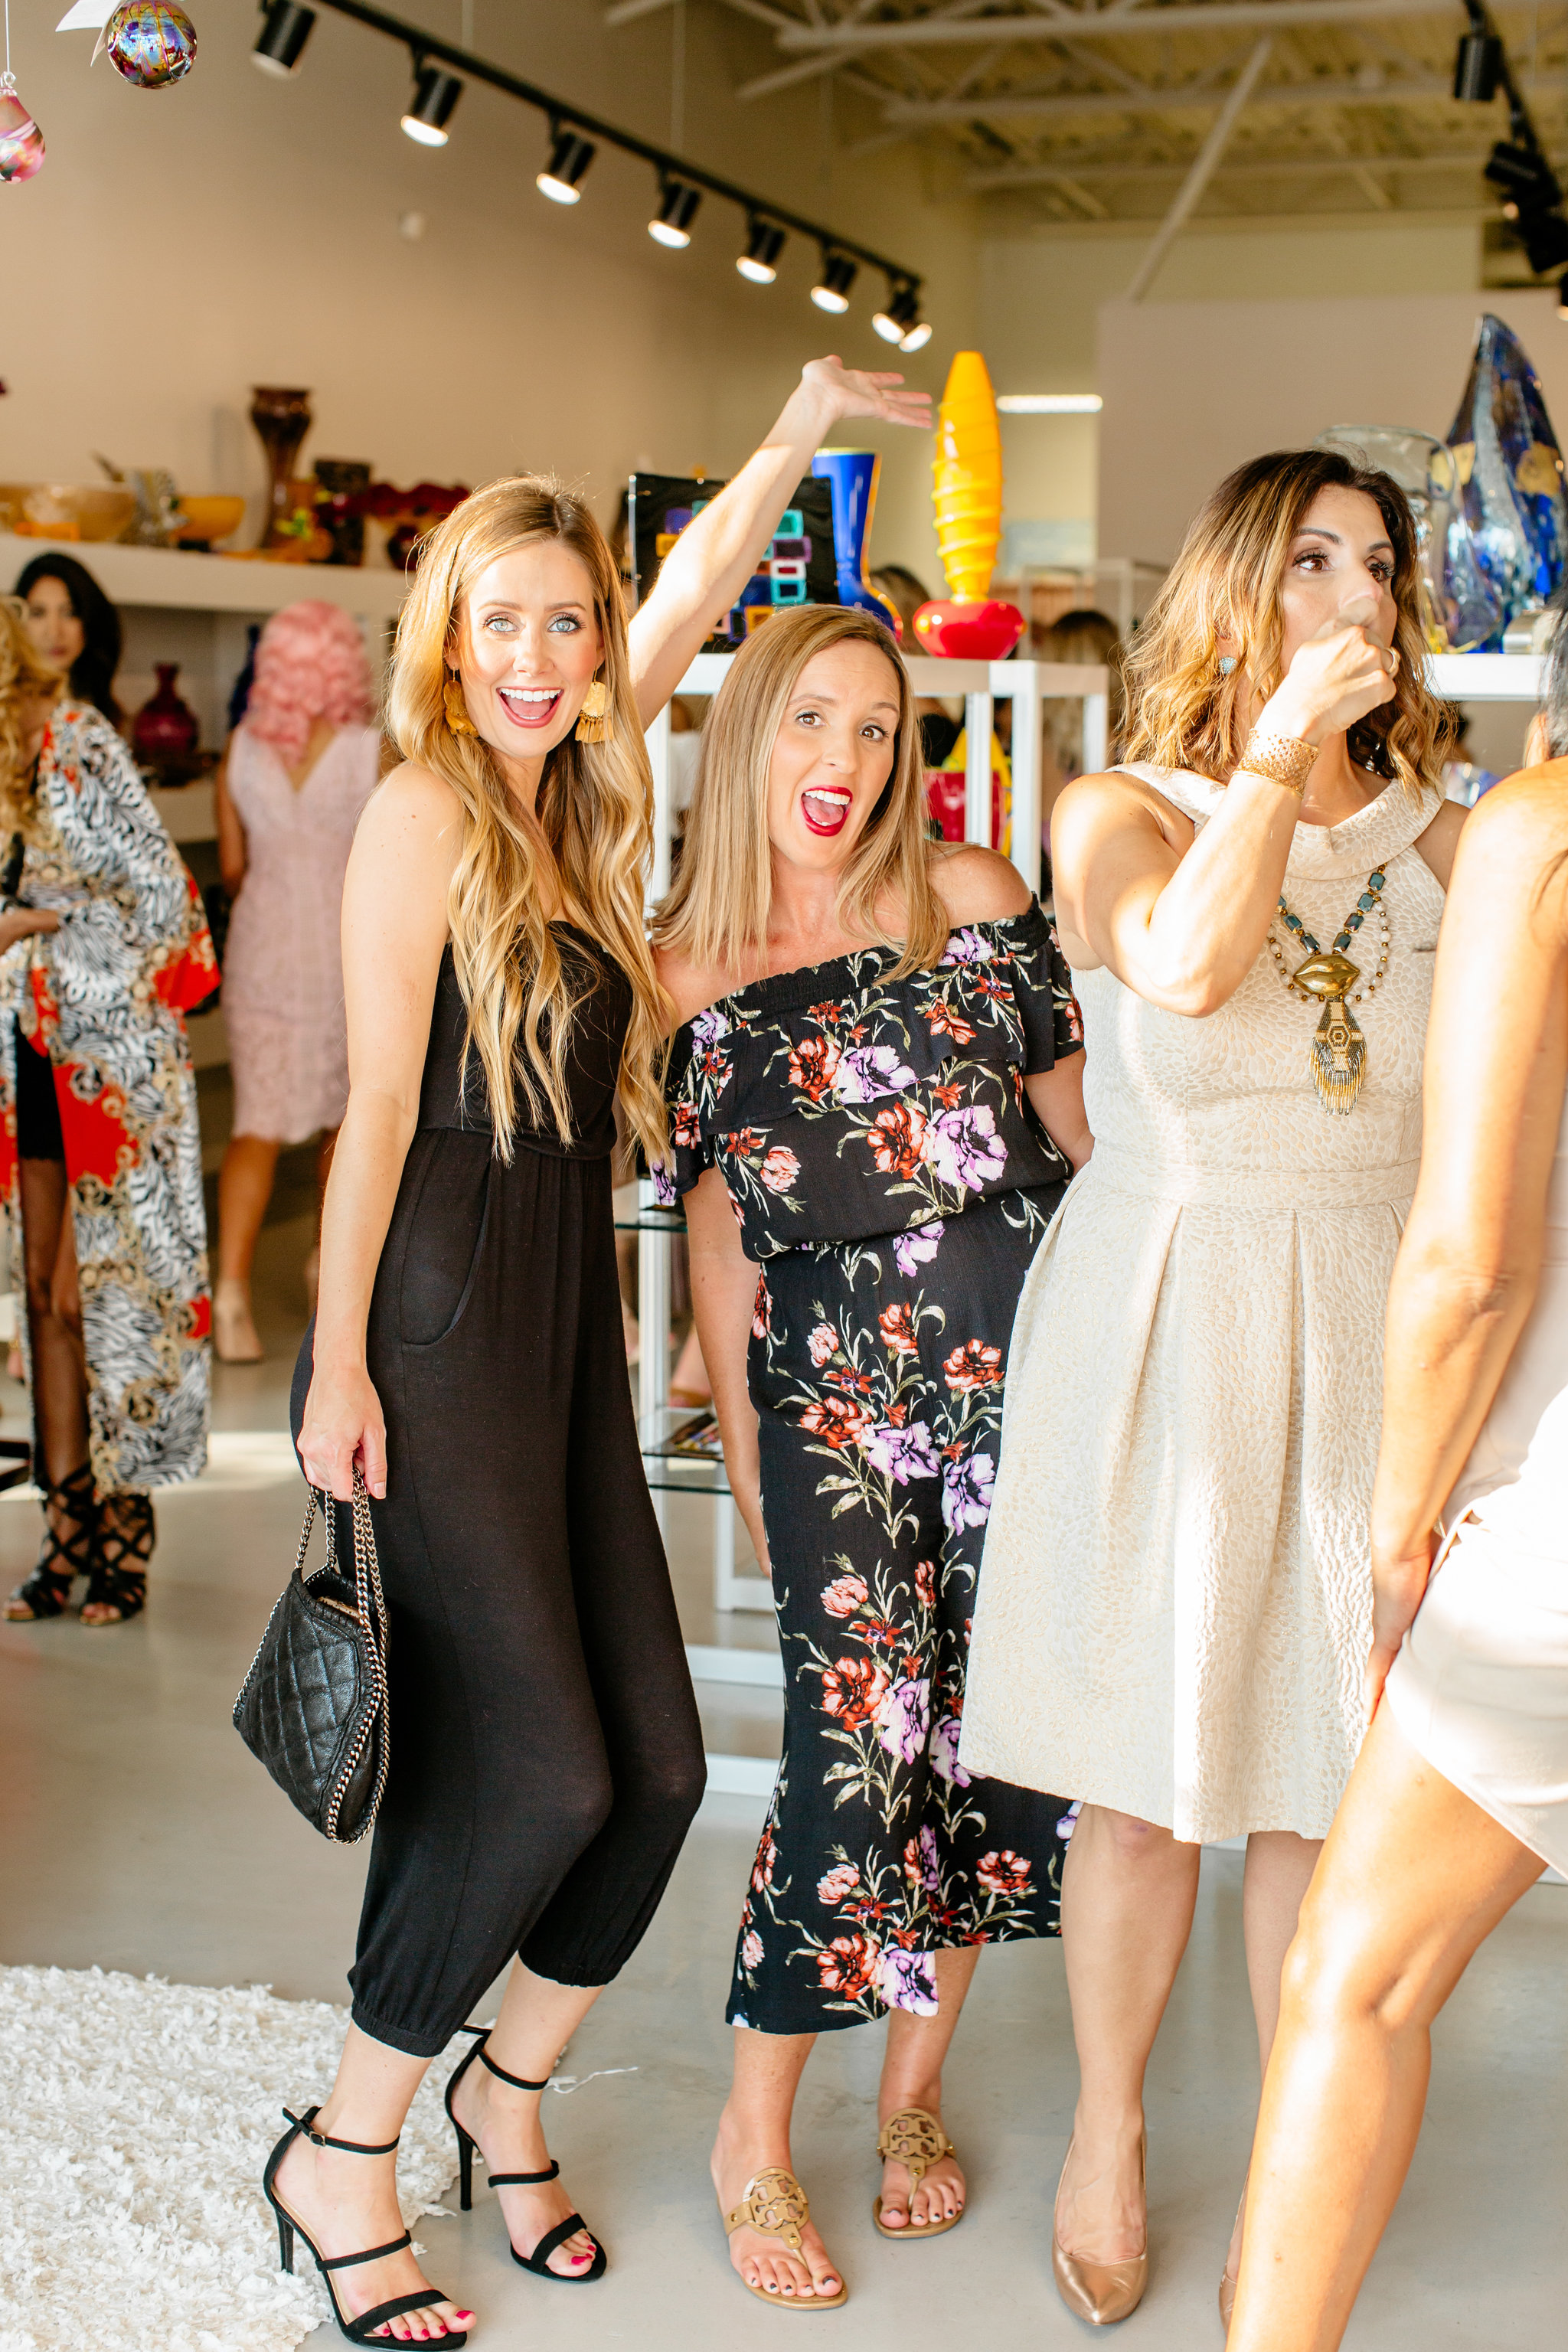 Alexa-Vossler-Photo_Dallas-Event-Photographer_Brite-Bar-Beauty-2018-Lipstick-Launch-Party-133.jpg